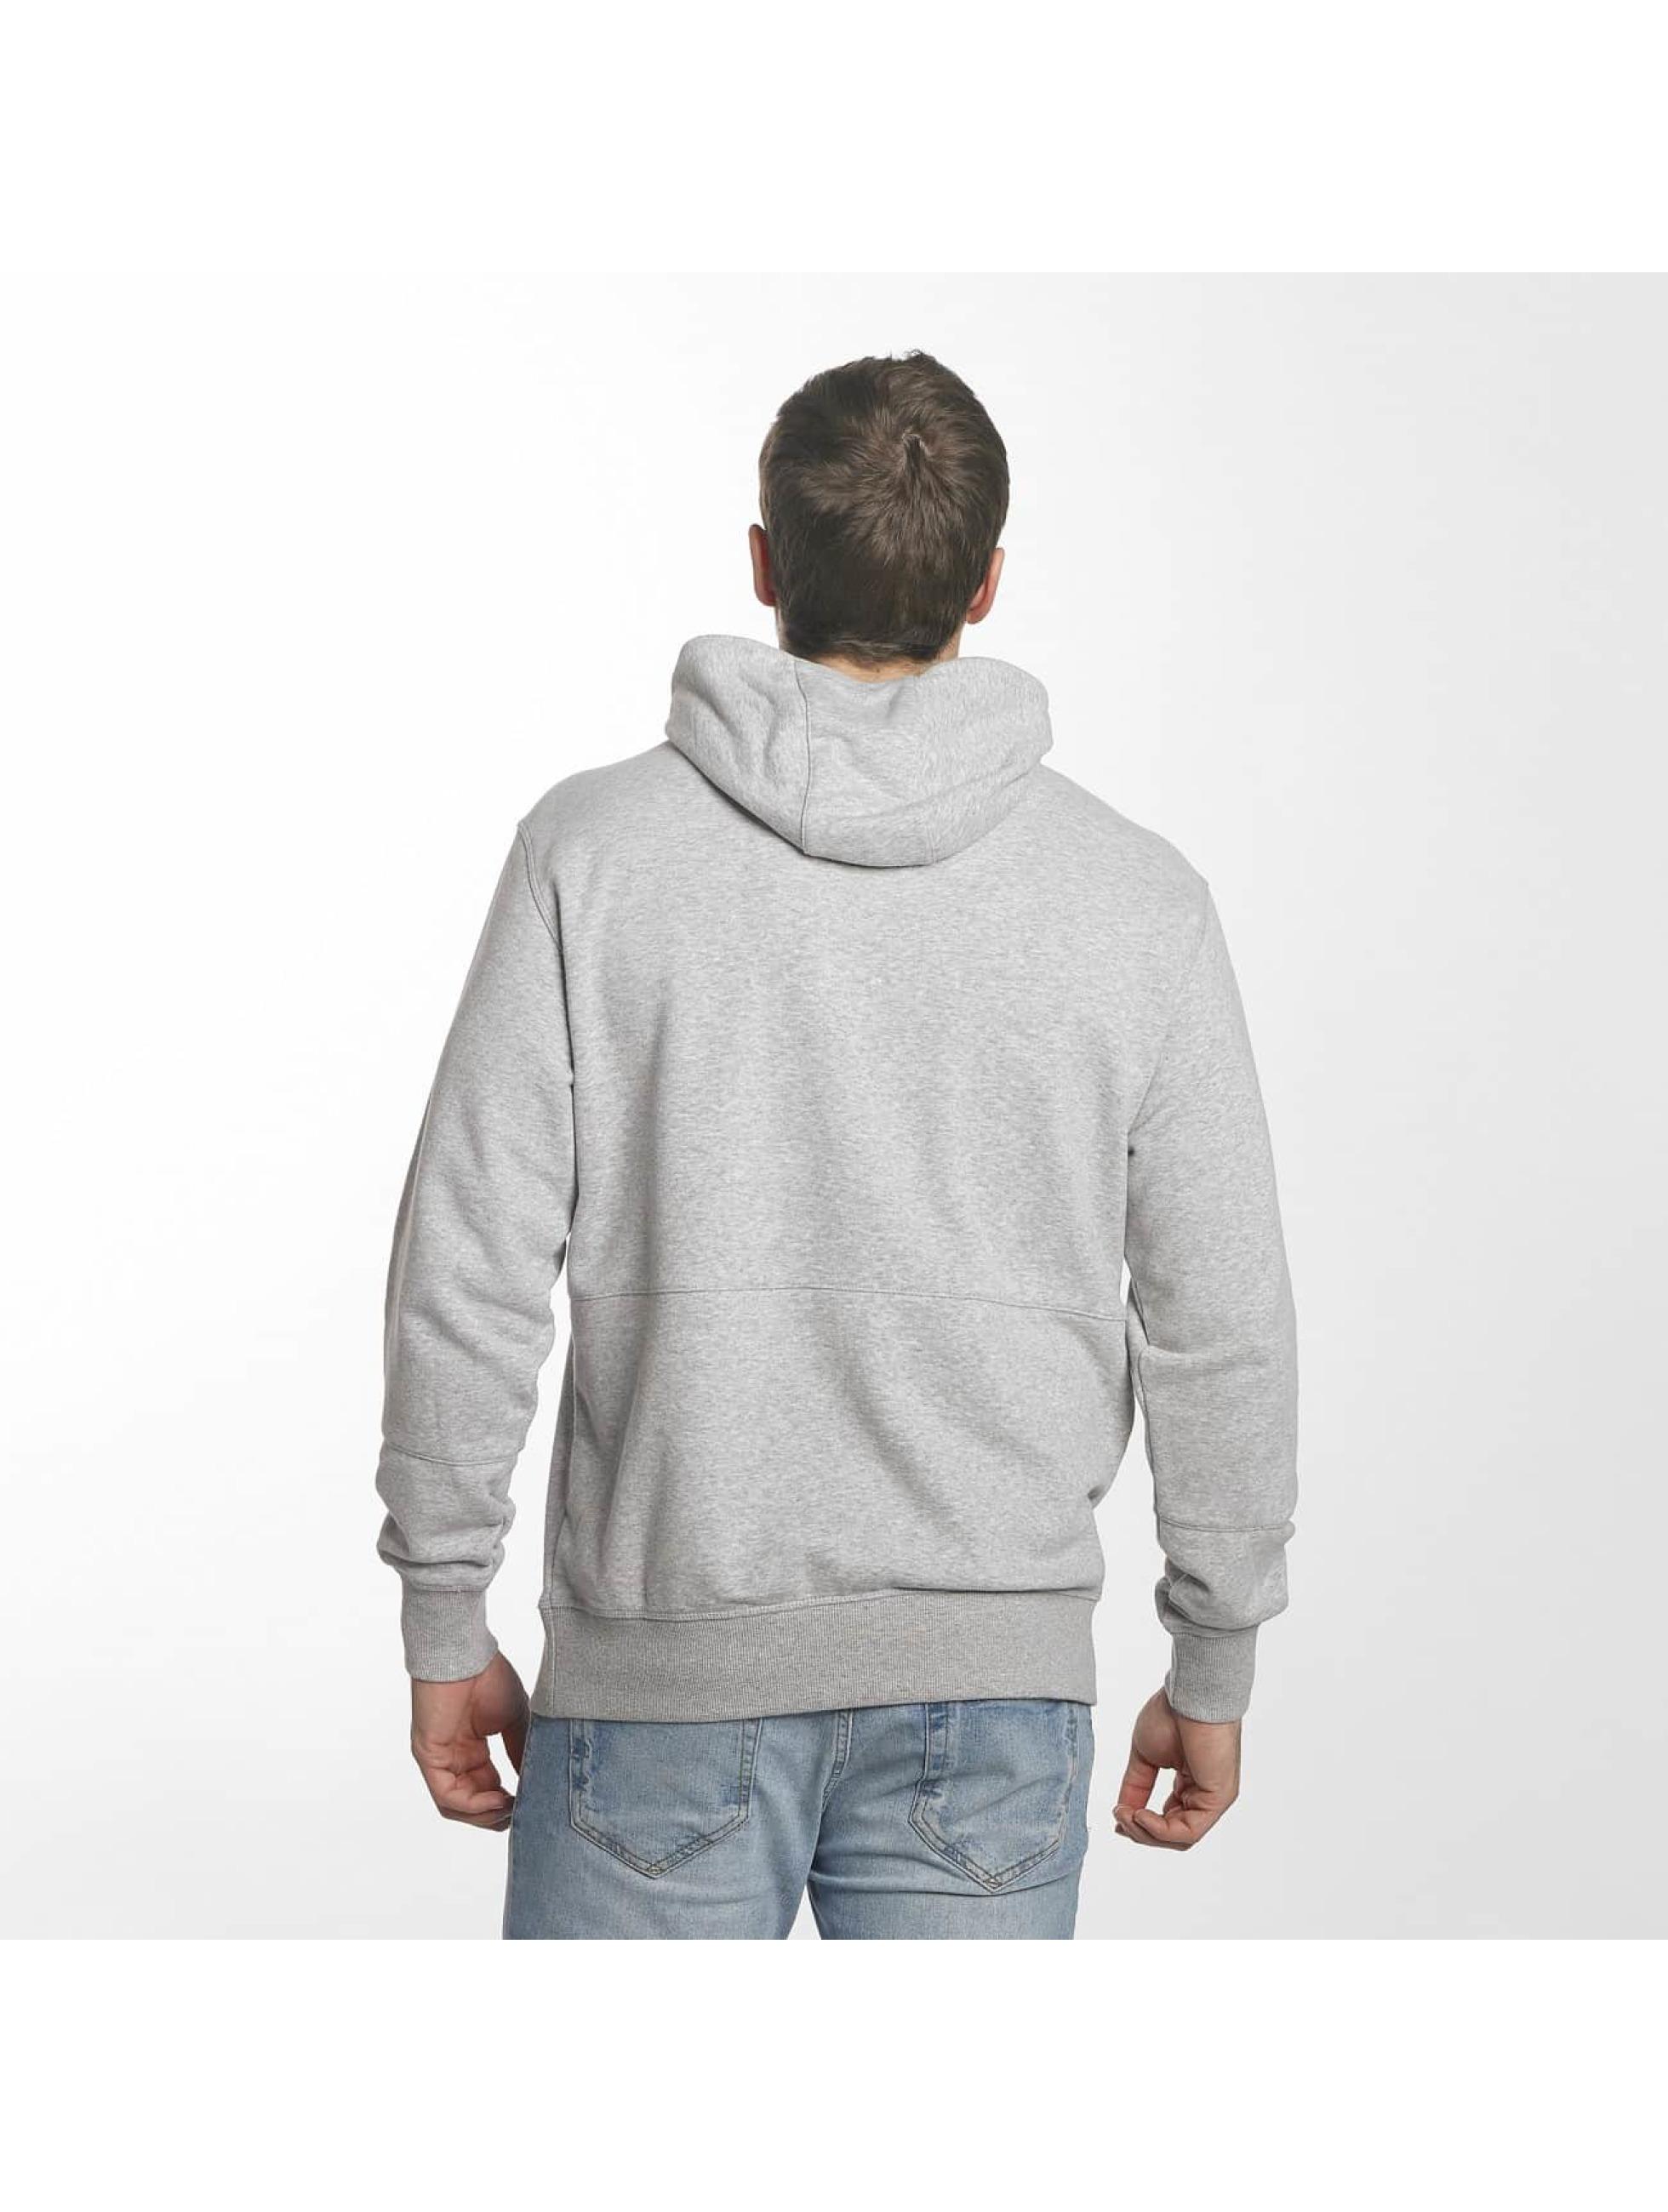 New Balance Hoody MT81557 Essentials grau